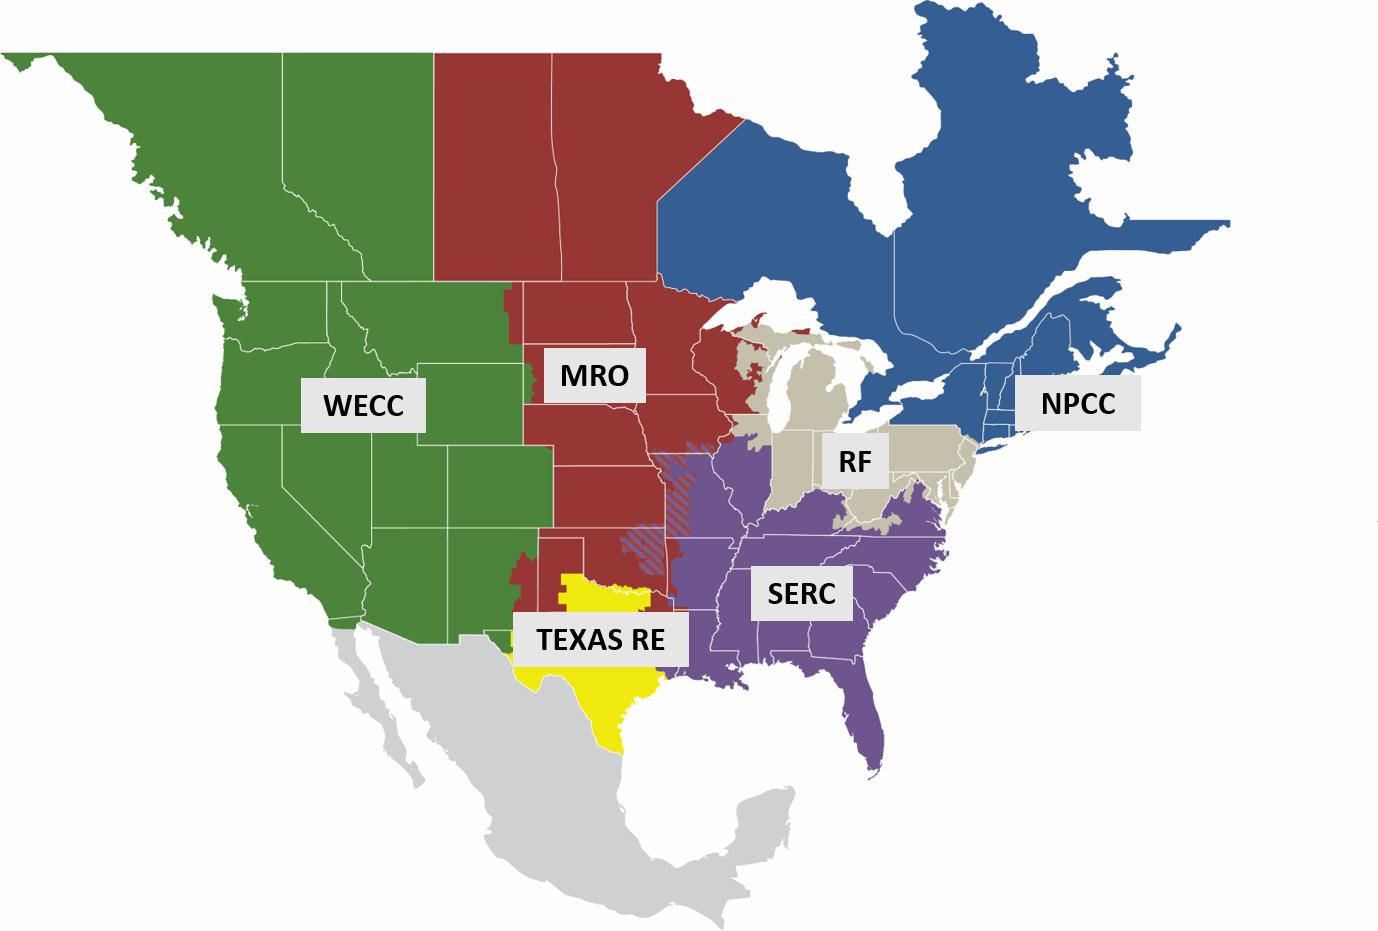 NERC Regional Entities